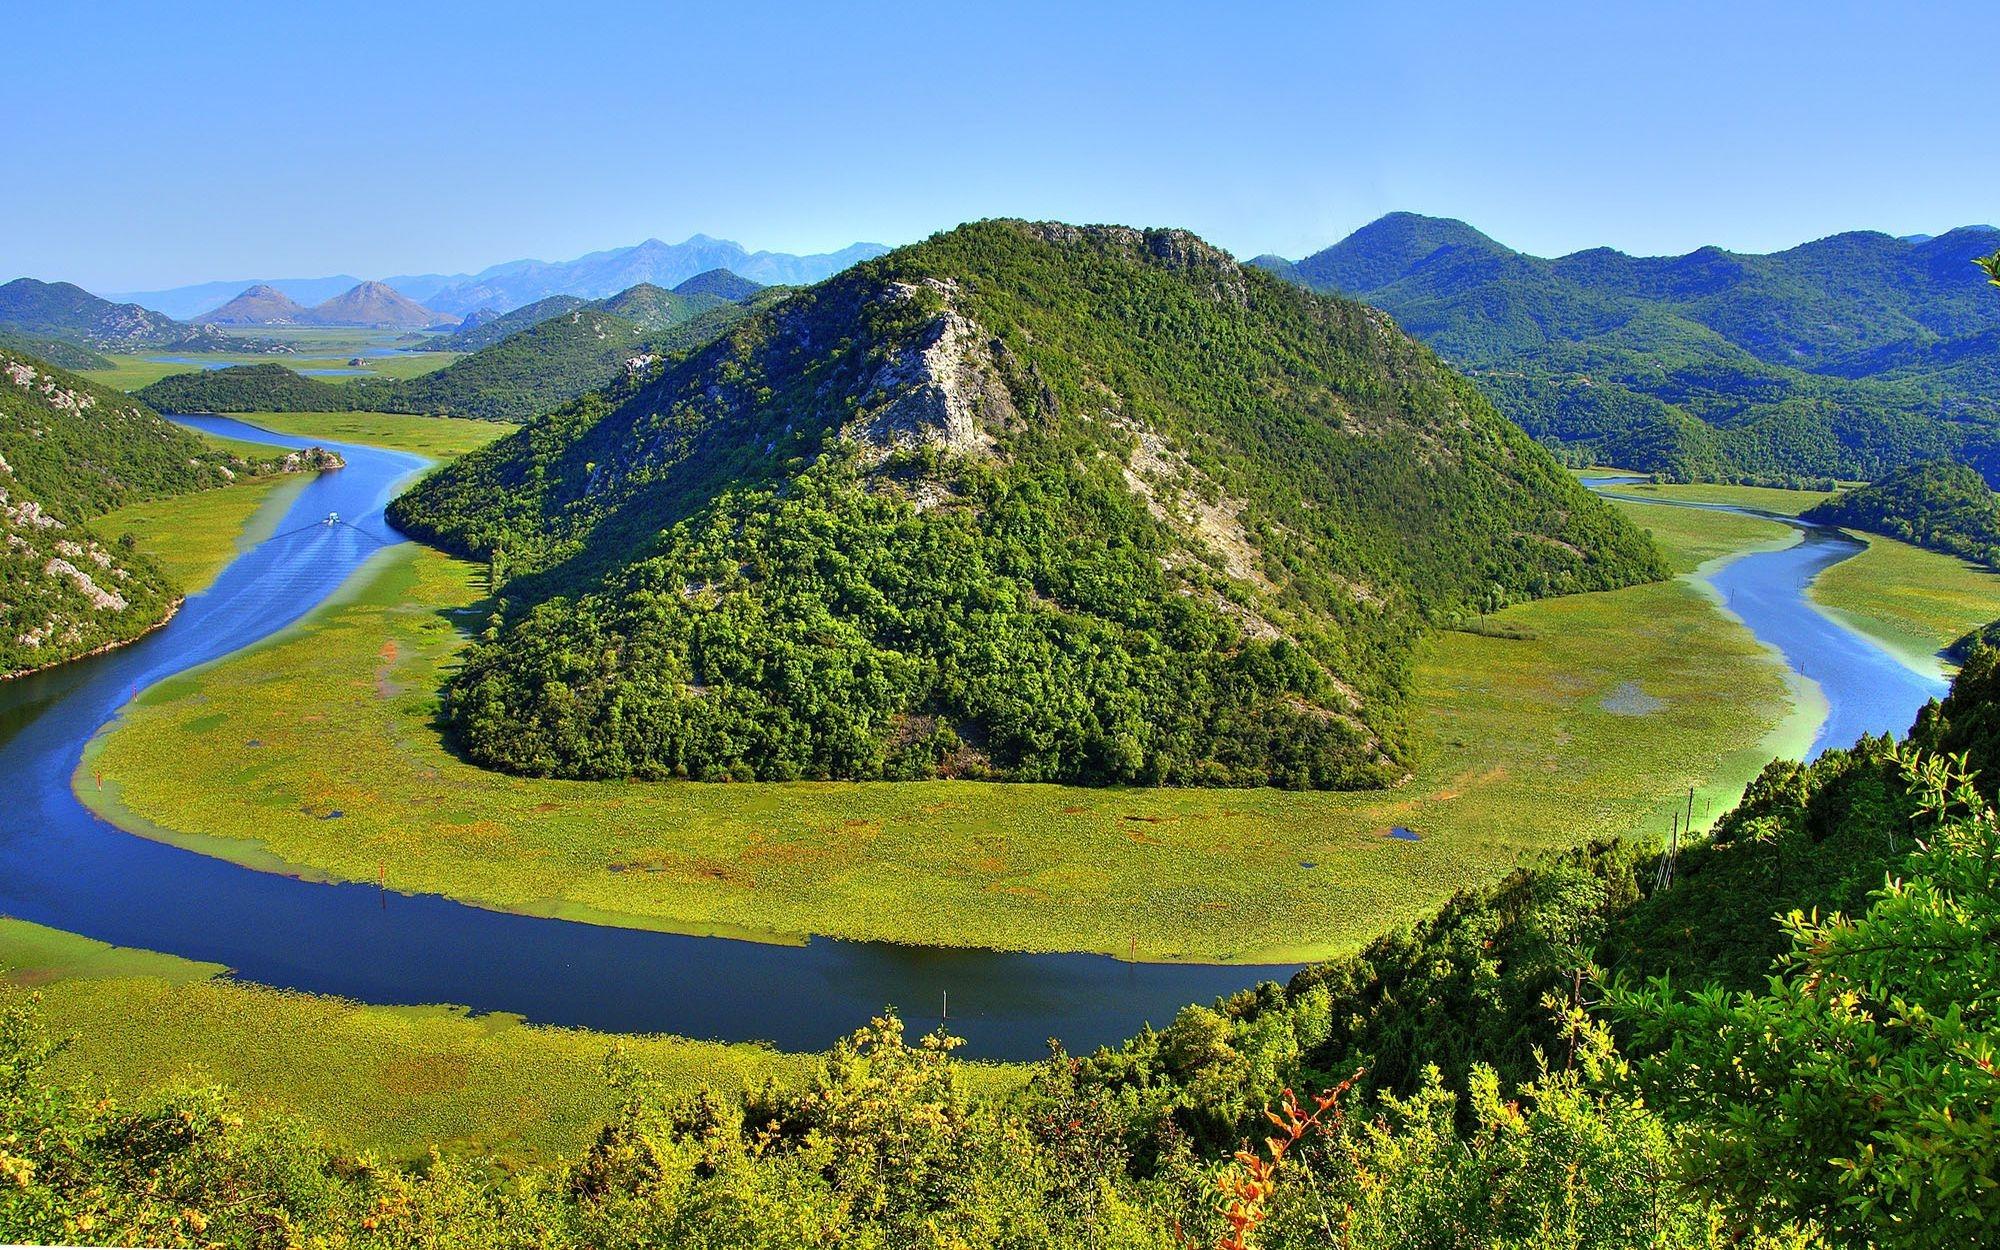 154639 Screensavers and Wallpapers Lake for phone. Download Lake, Nature, Montenegro, Skadarsky, Skadar, Tsrnojevic River, Crnojevicha River pictures for free